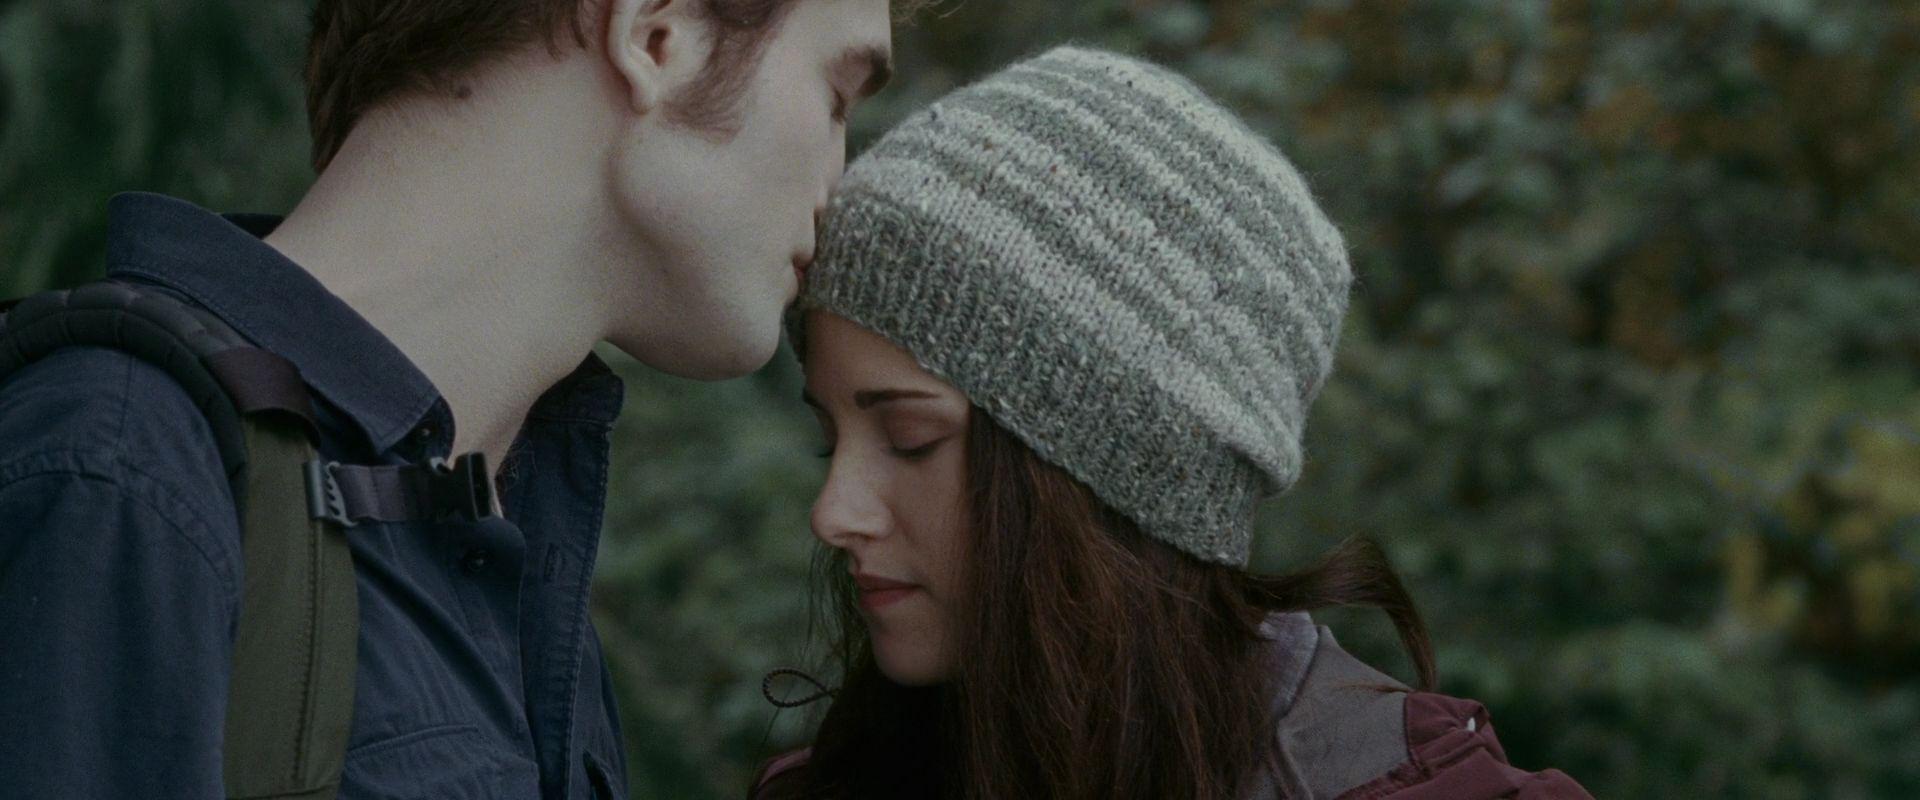 Robert Pattinson Edward Cullen - newhairstylesformen2014.com